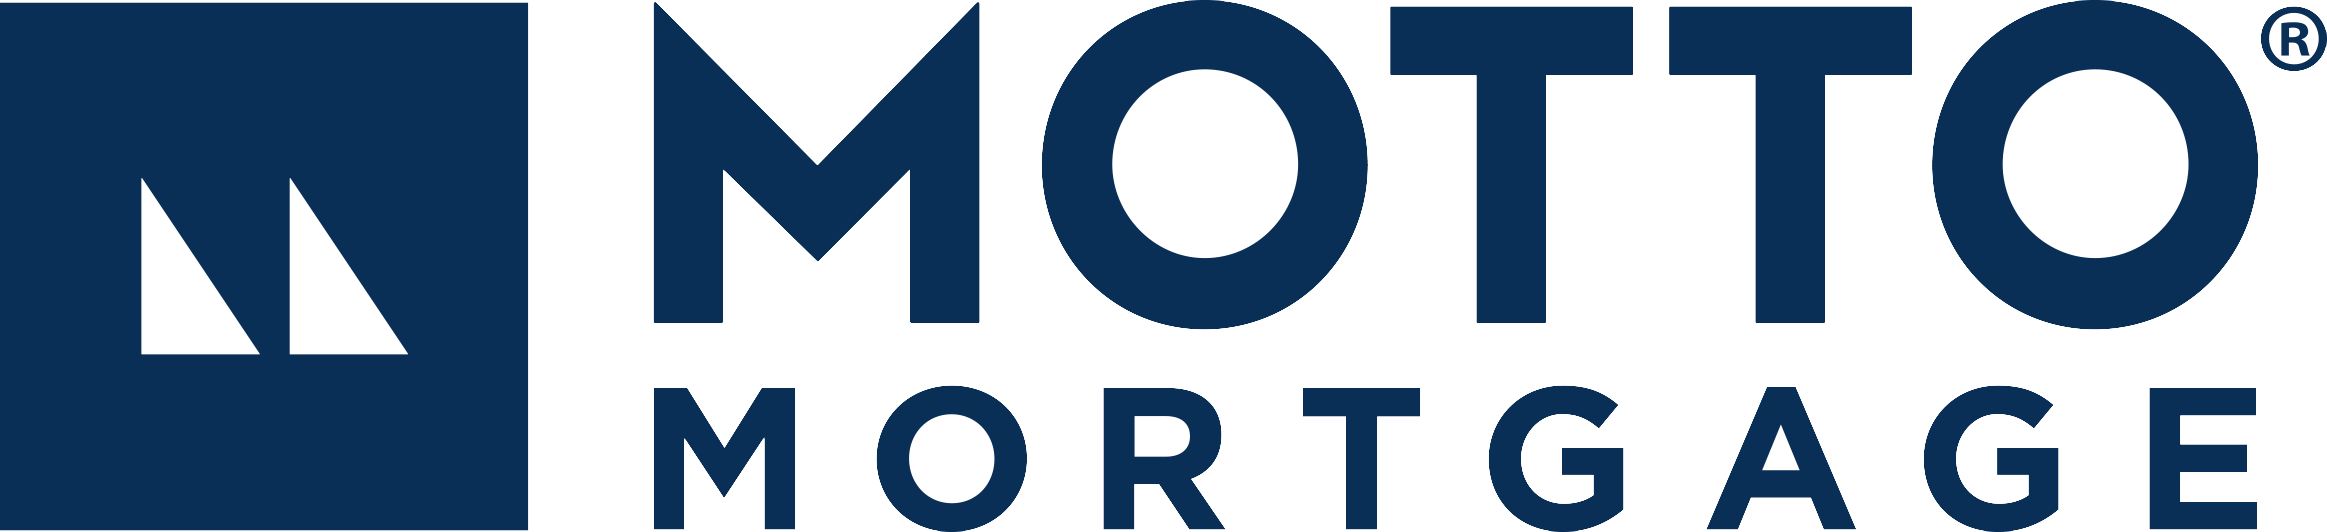 Motto Mortgage Infinite logo